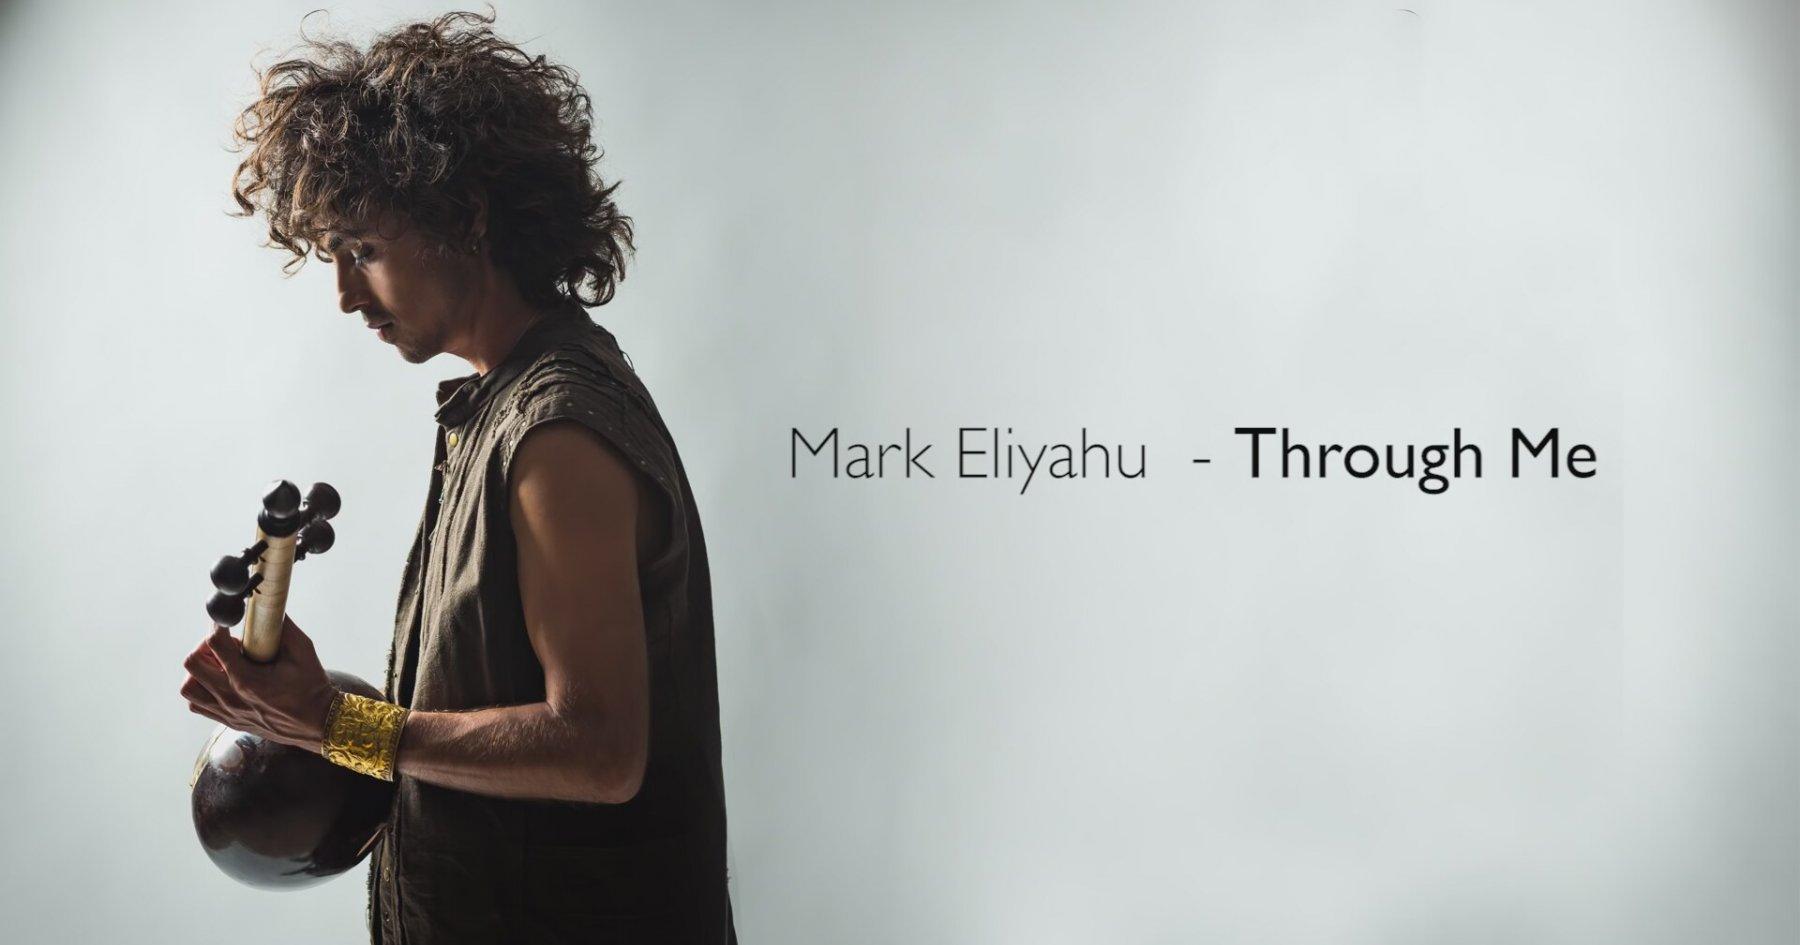 Mark Eliyahu  Through Me